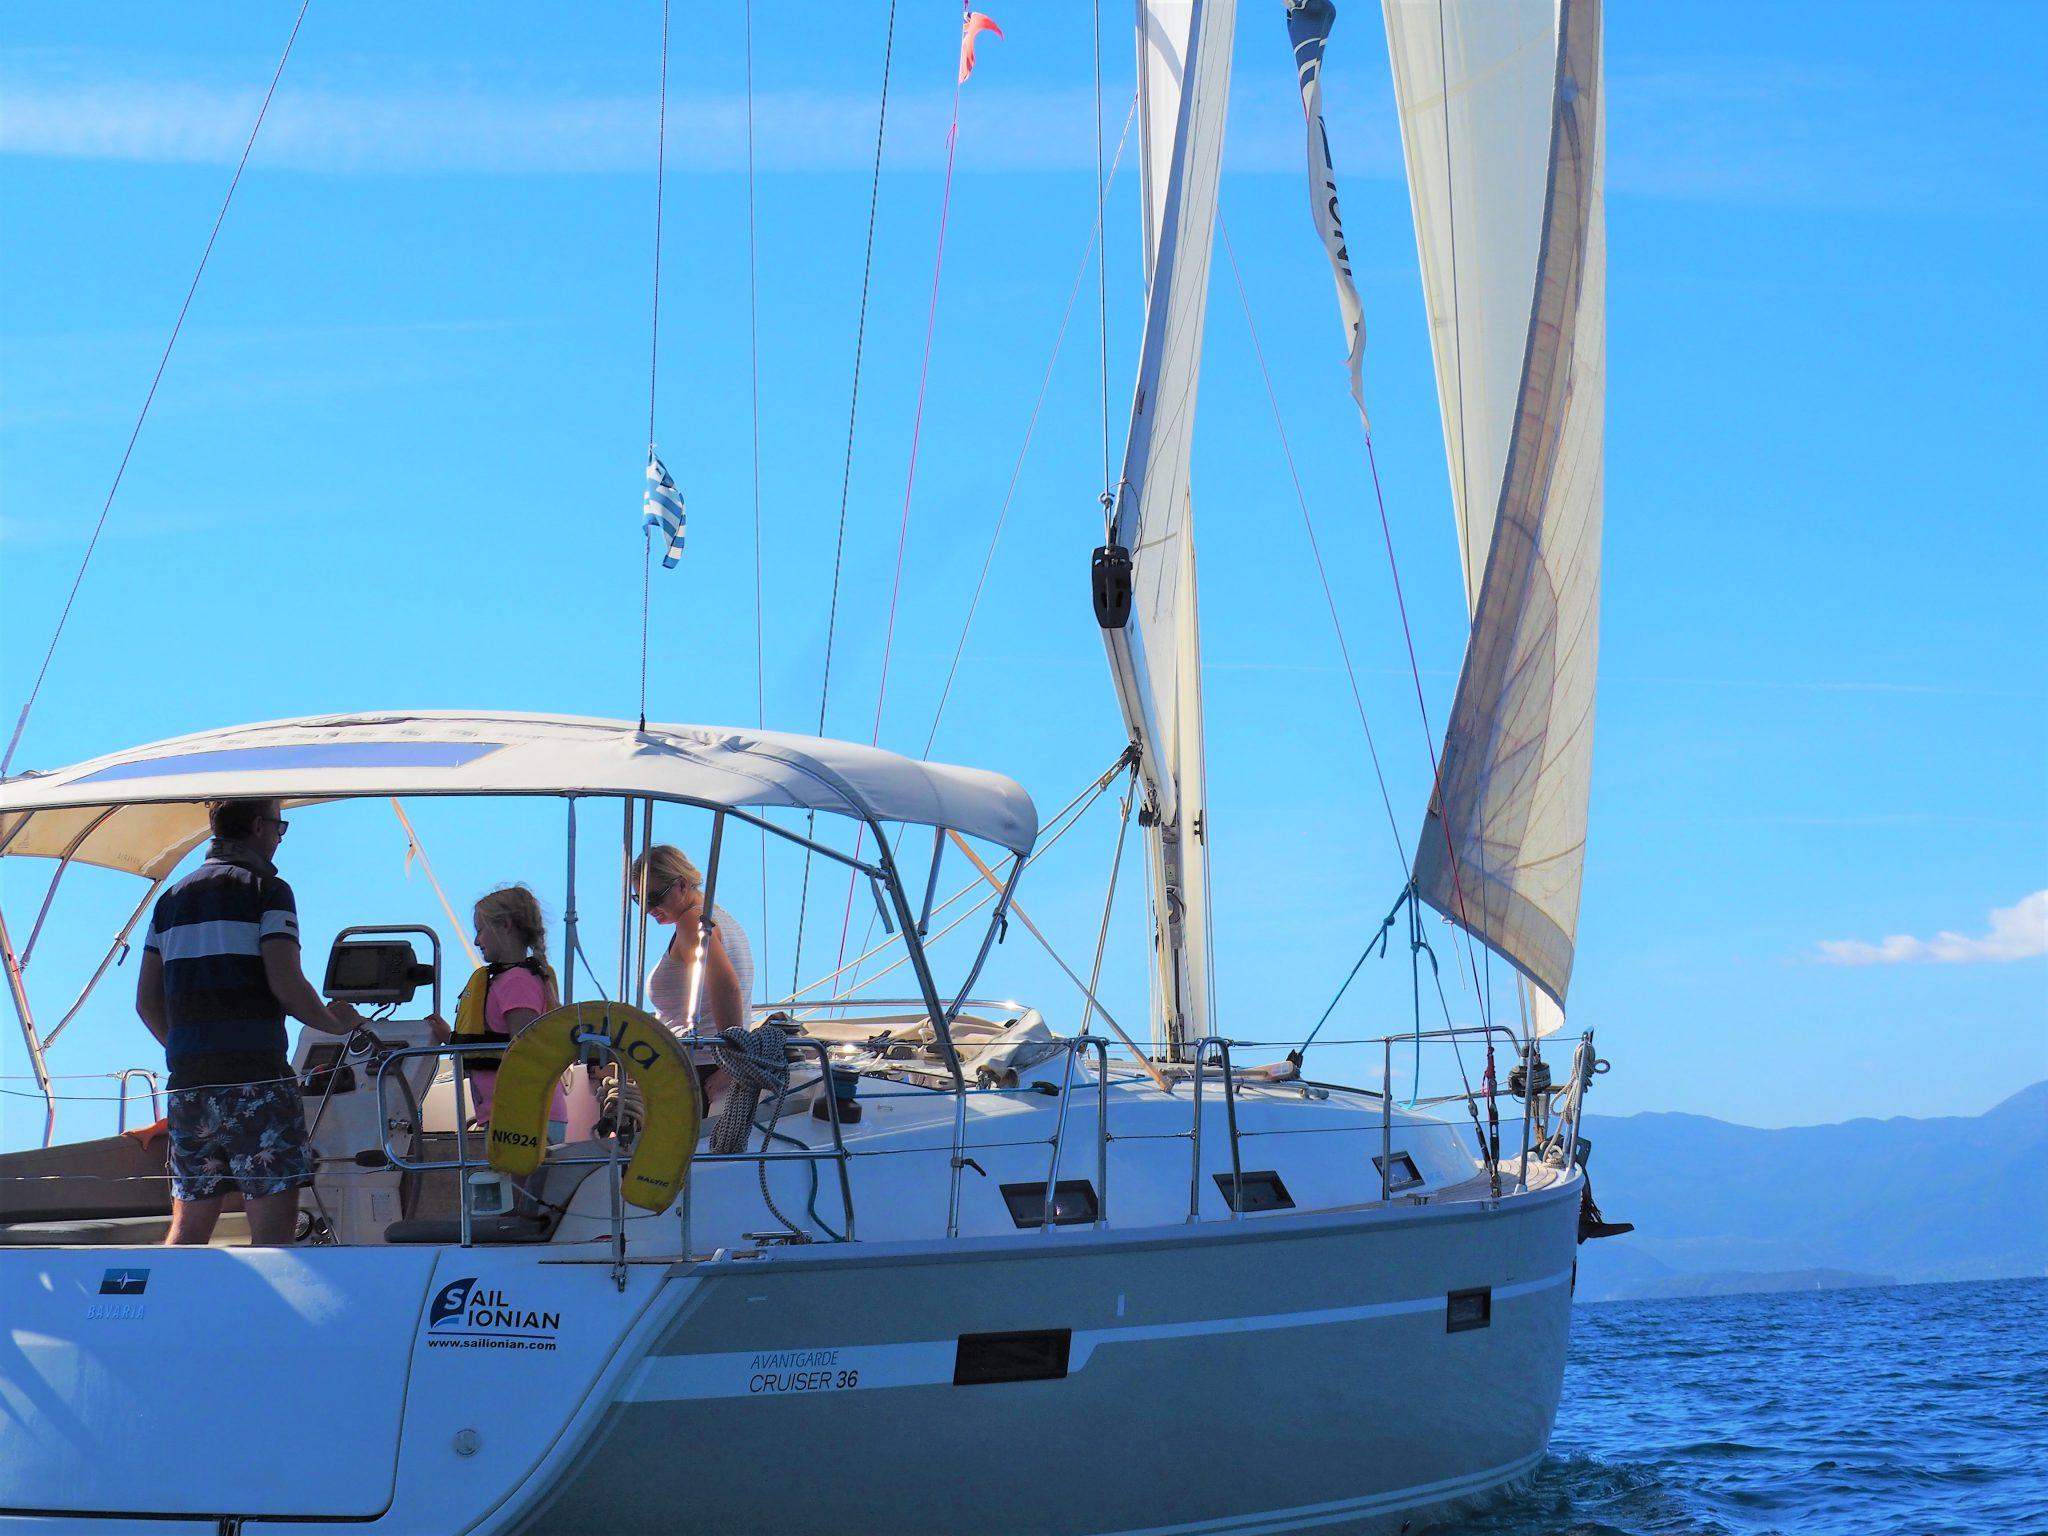 Sail Ionian Informal Flotilla